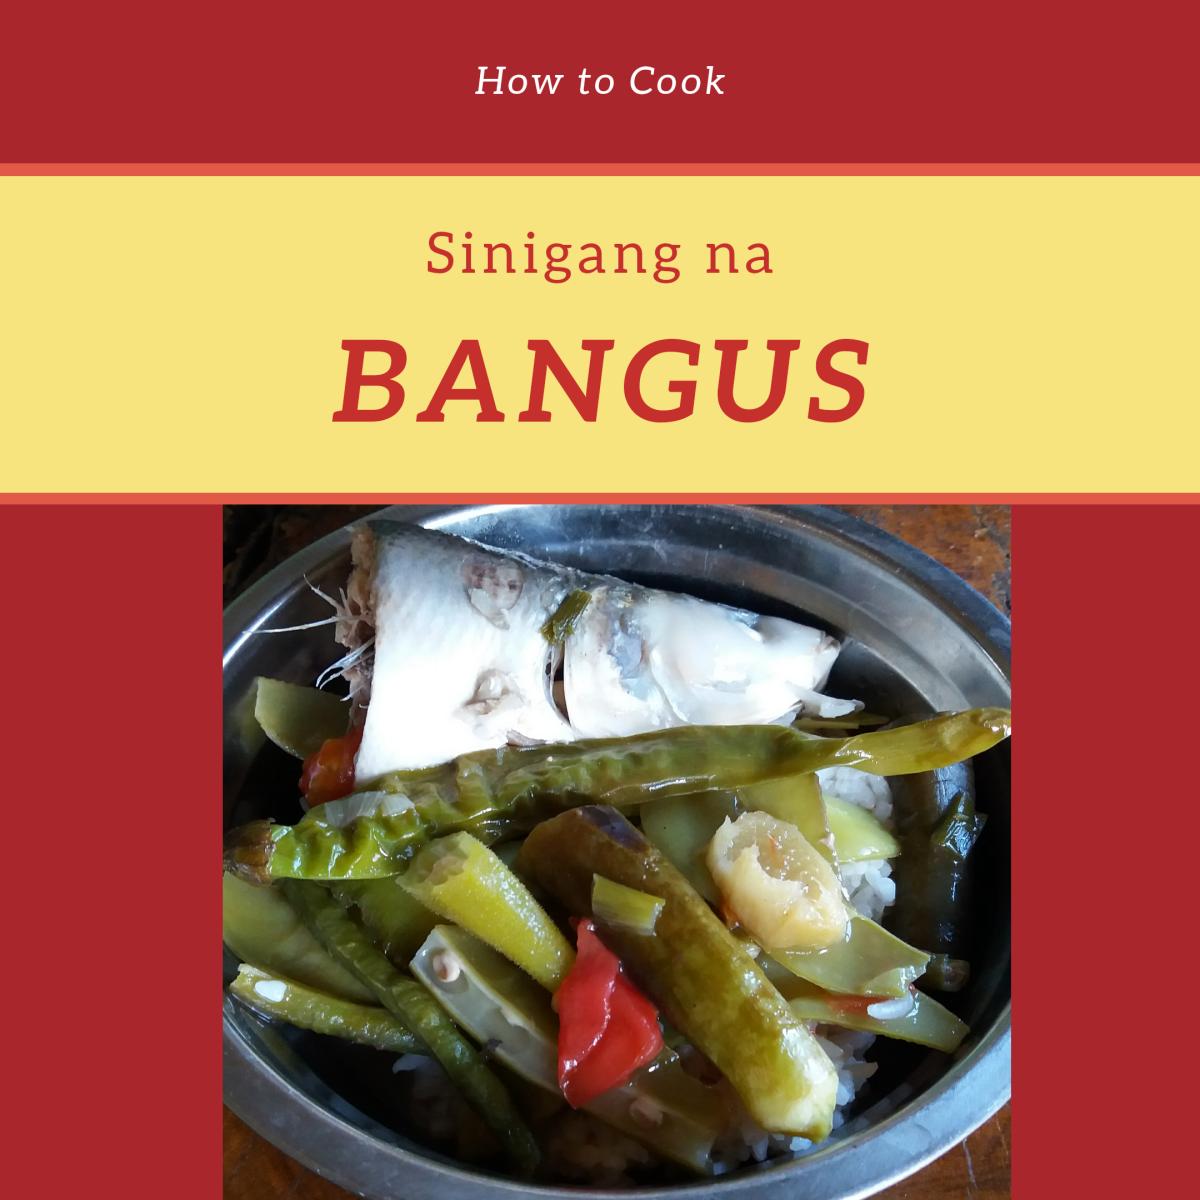 How to Cook Sinigang na Bangus: A Filipino-Inspired Dish